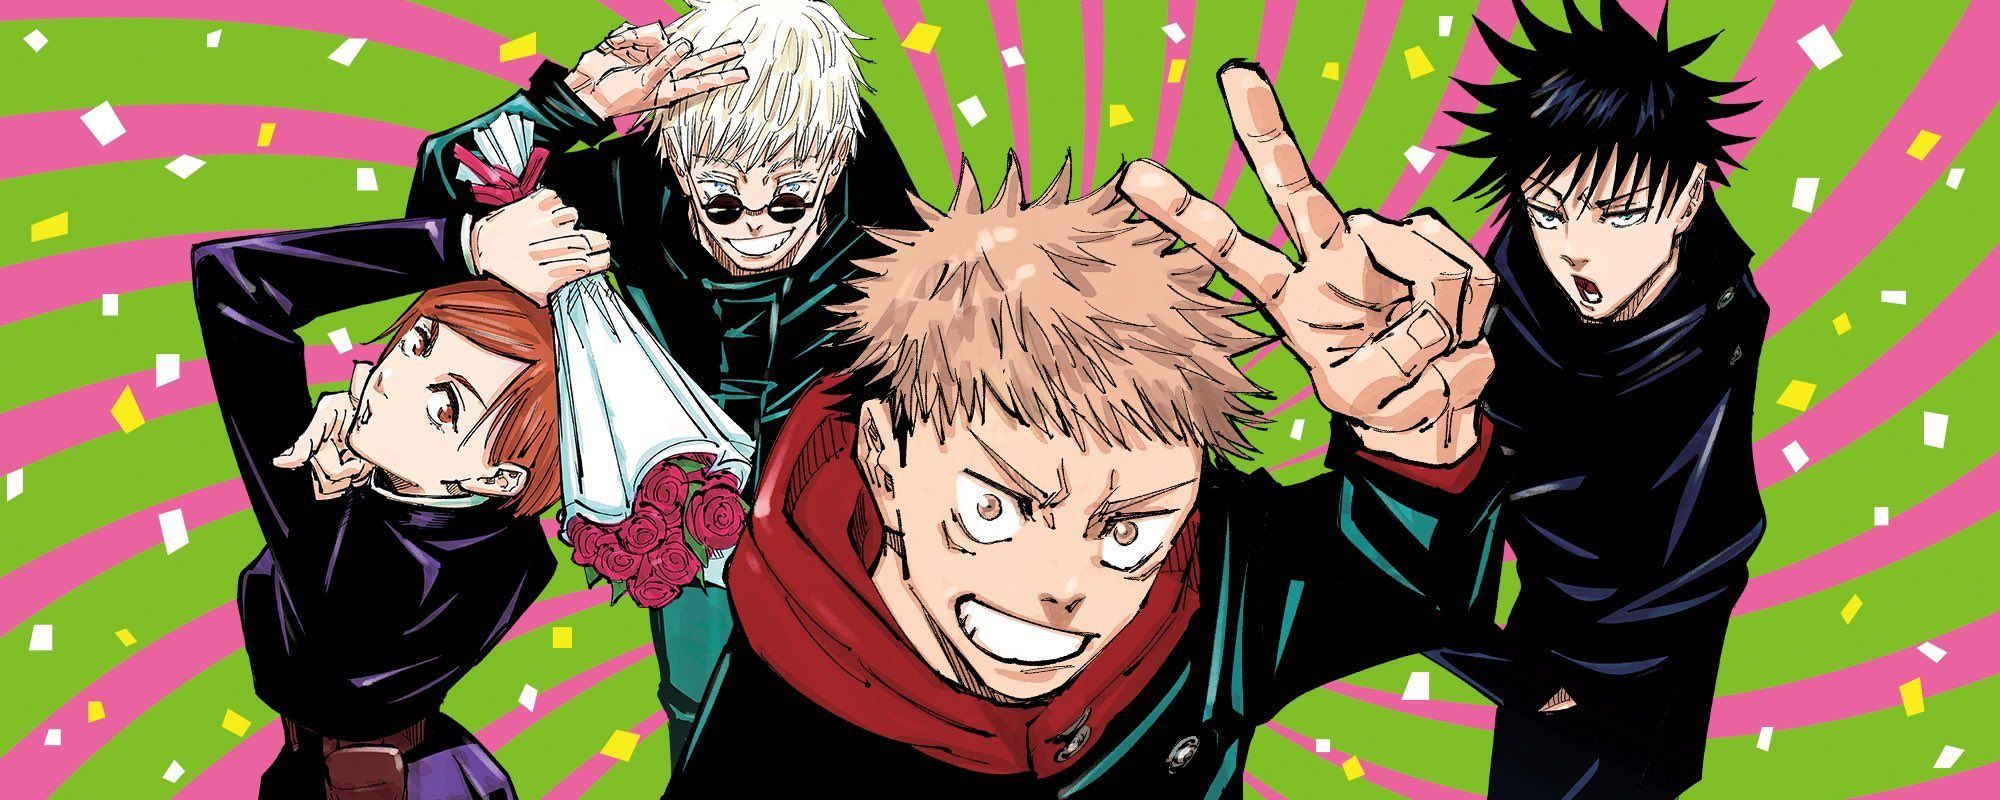 Gabs ツ jjk szn on twitter jujutsu anime latest anime